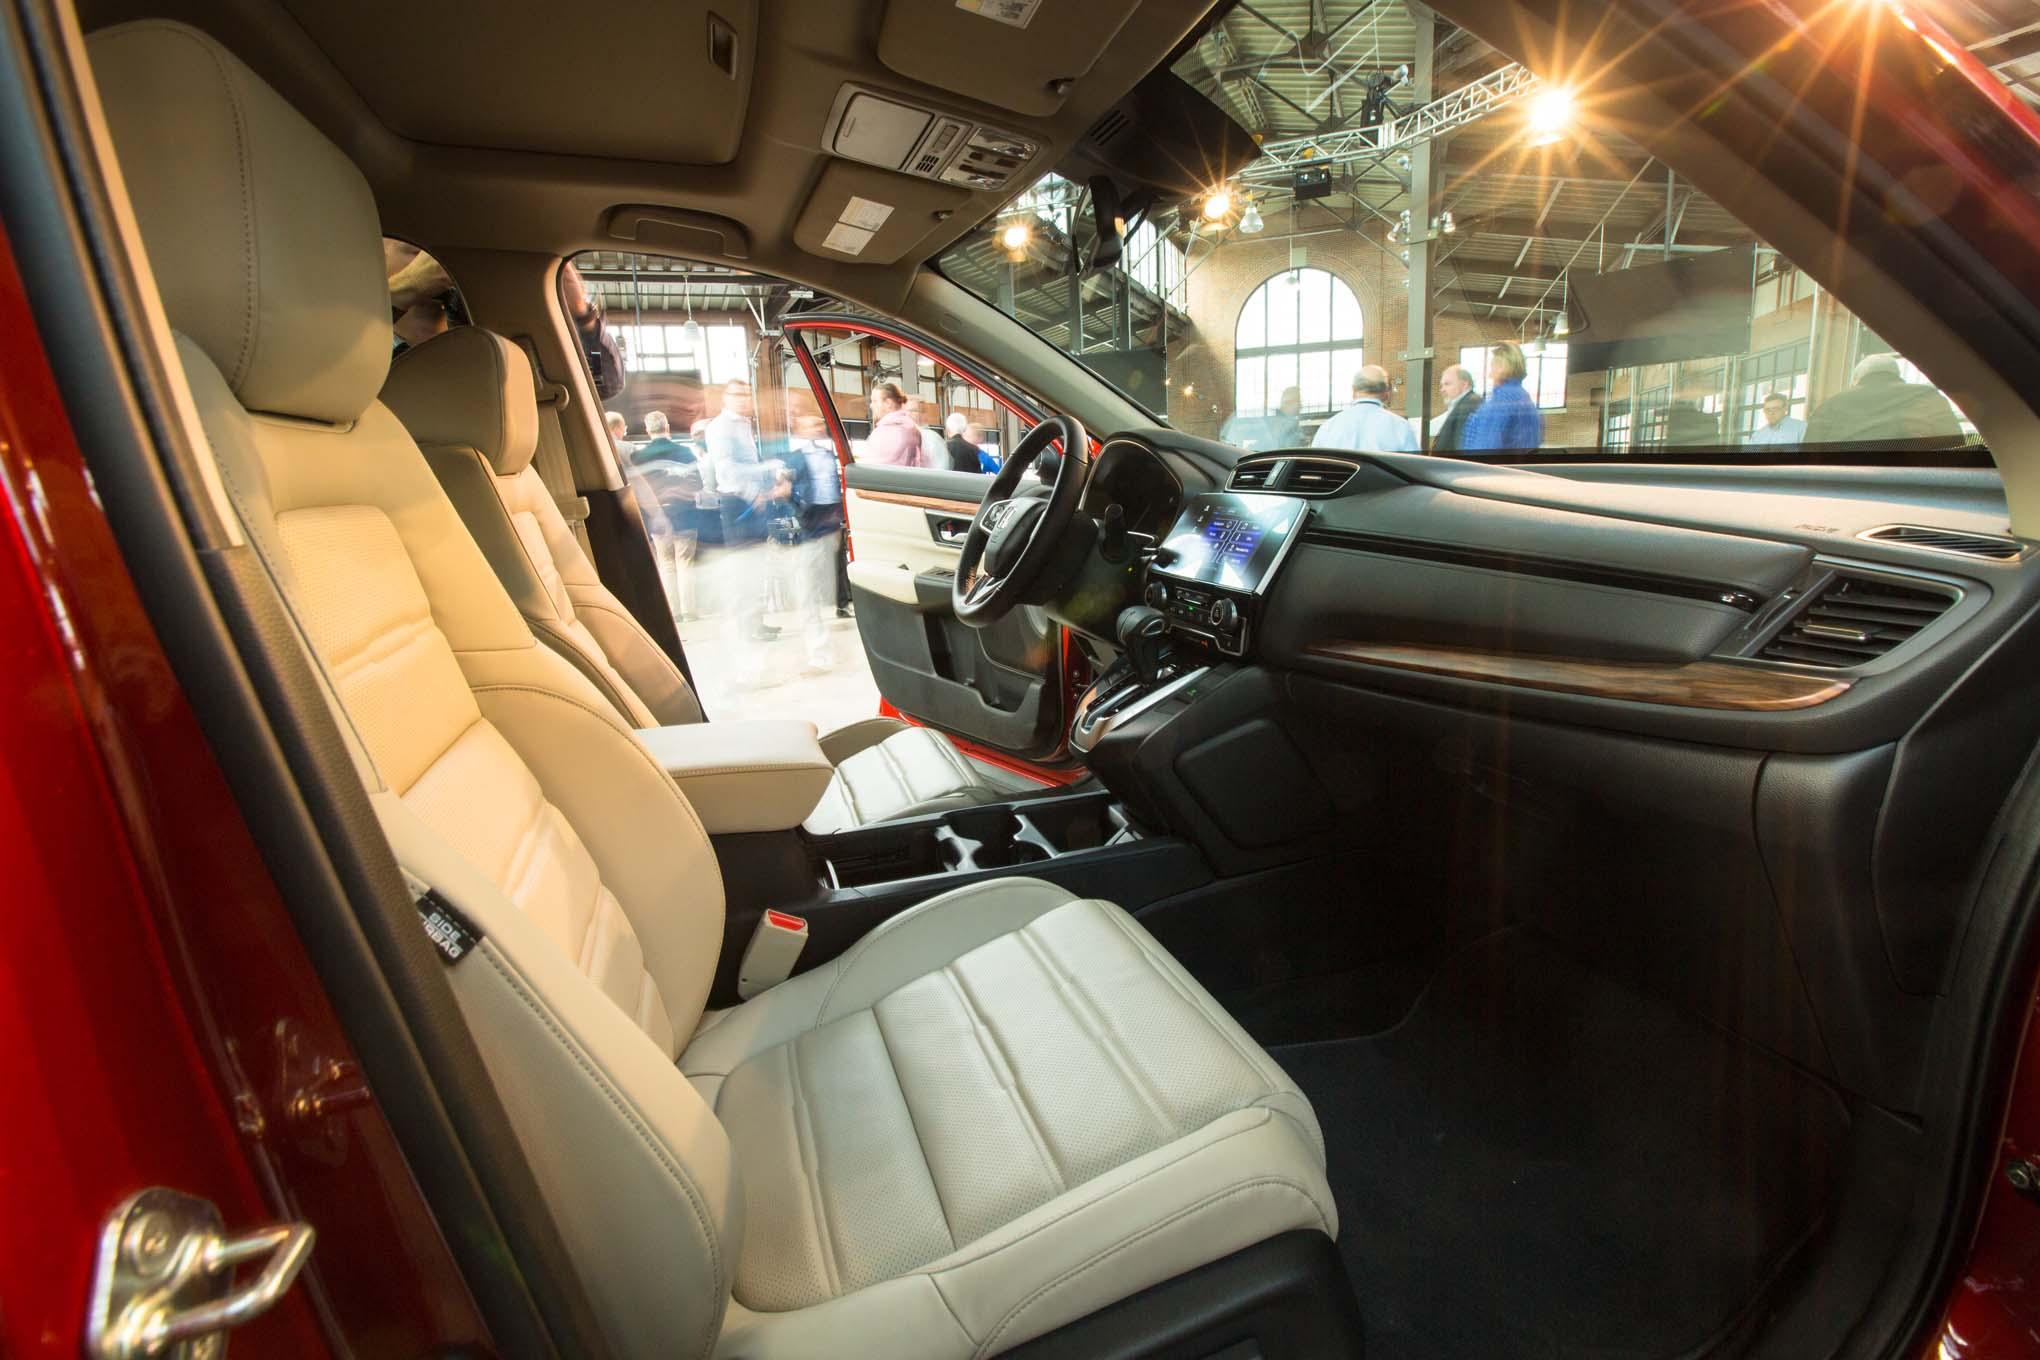 2017-Honda-CR-V-front-interior-seats-02